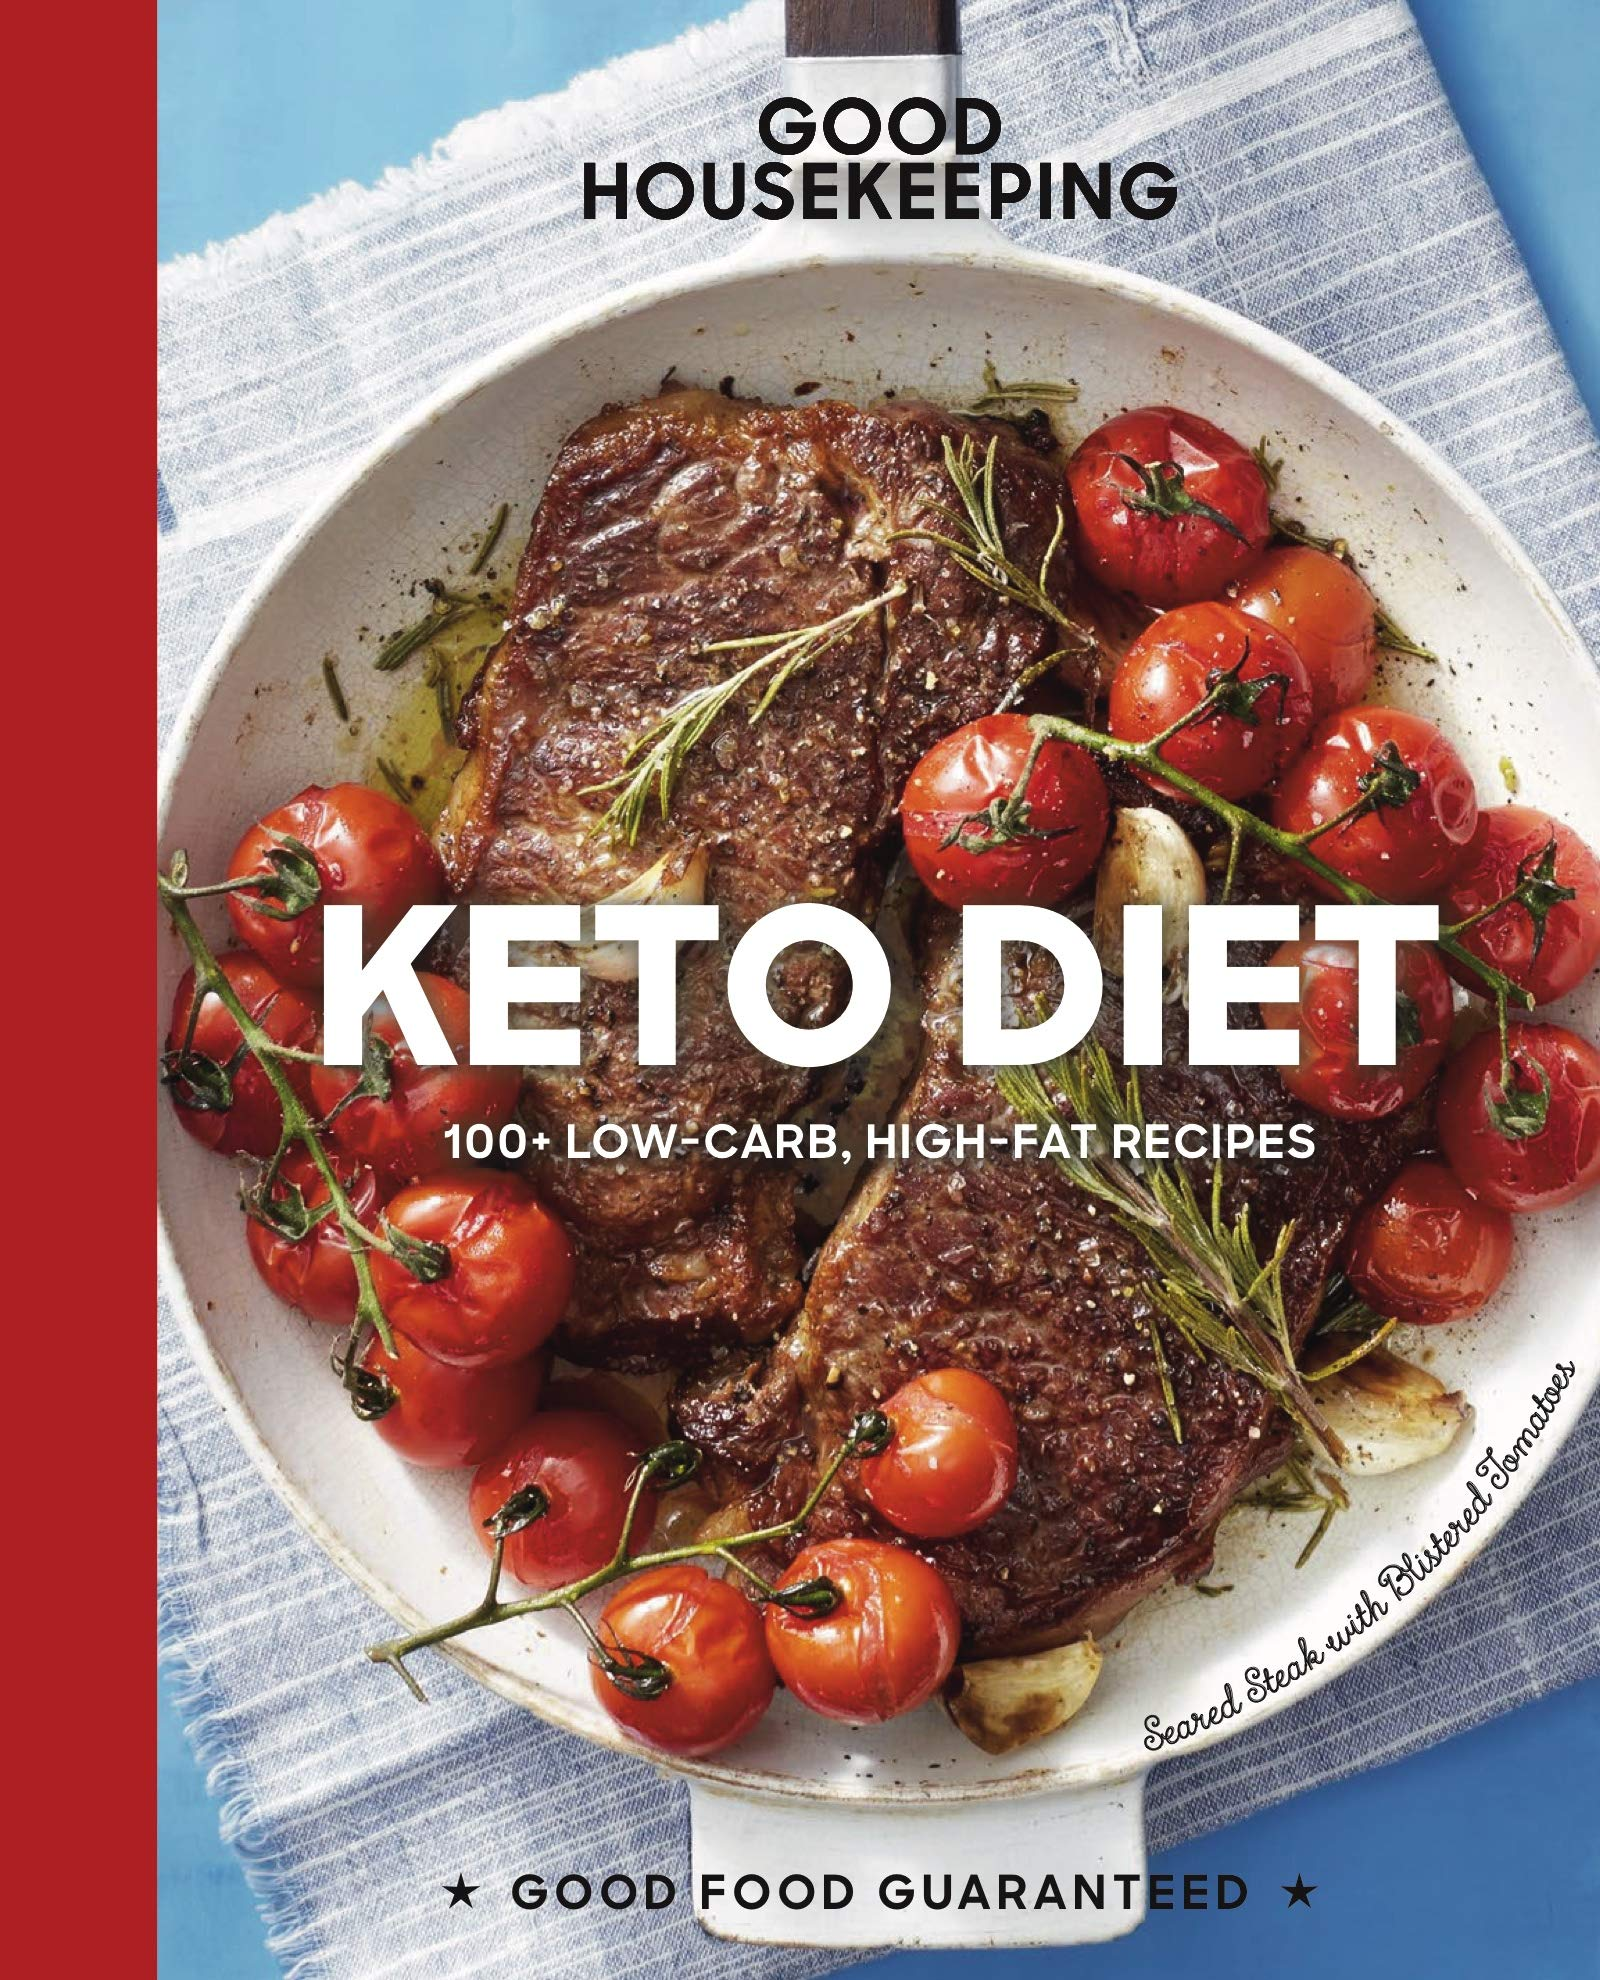 is pork okay for the keto diet